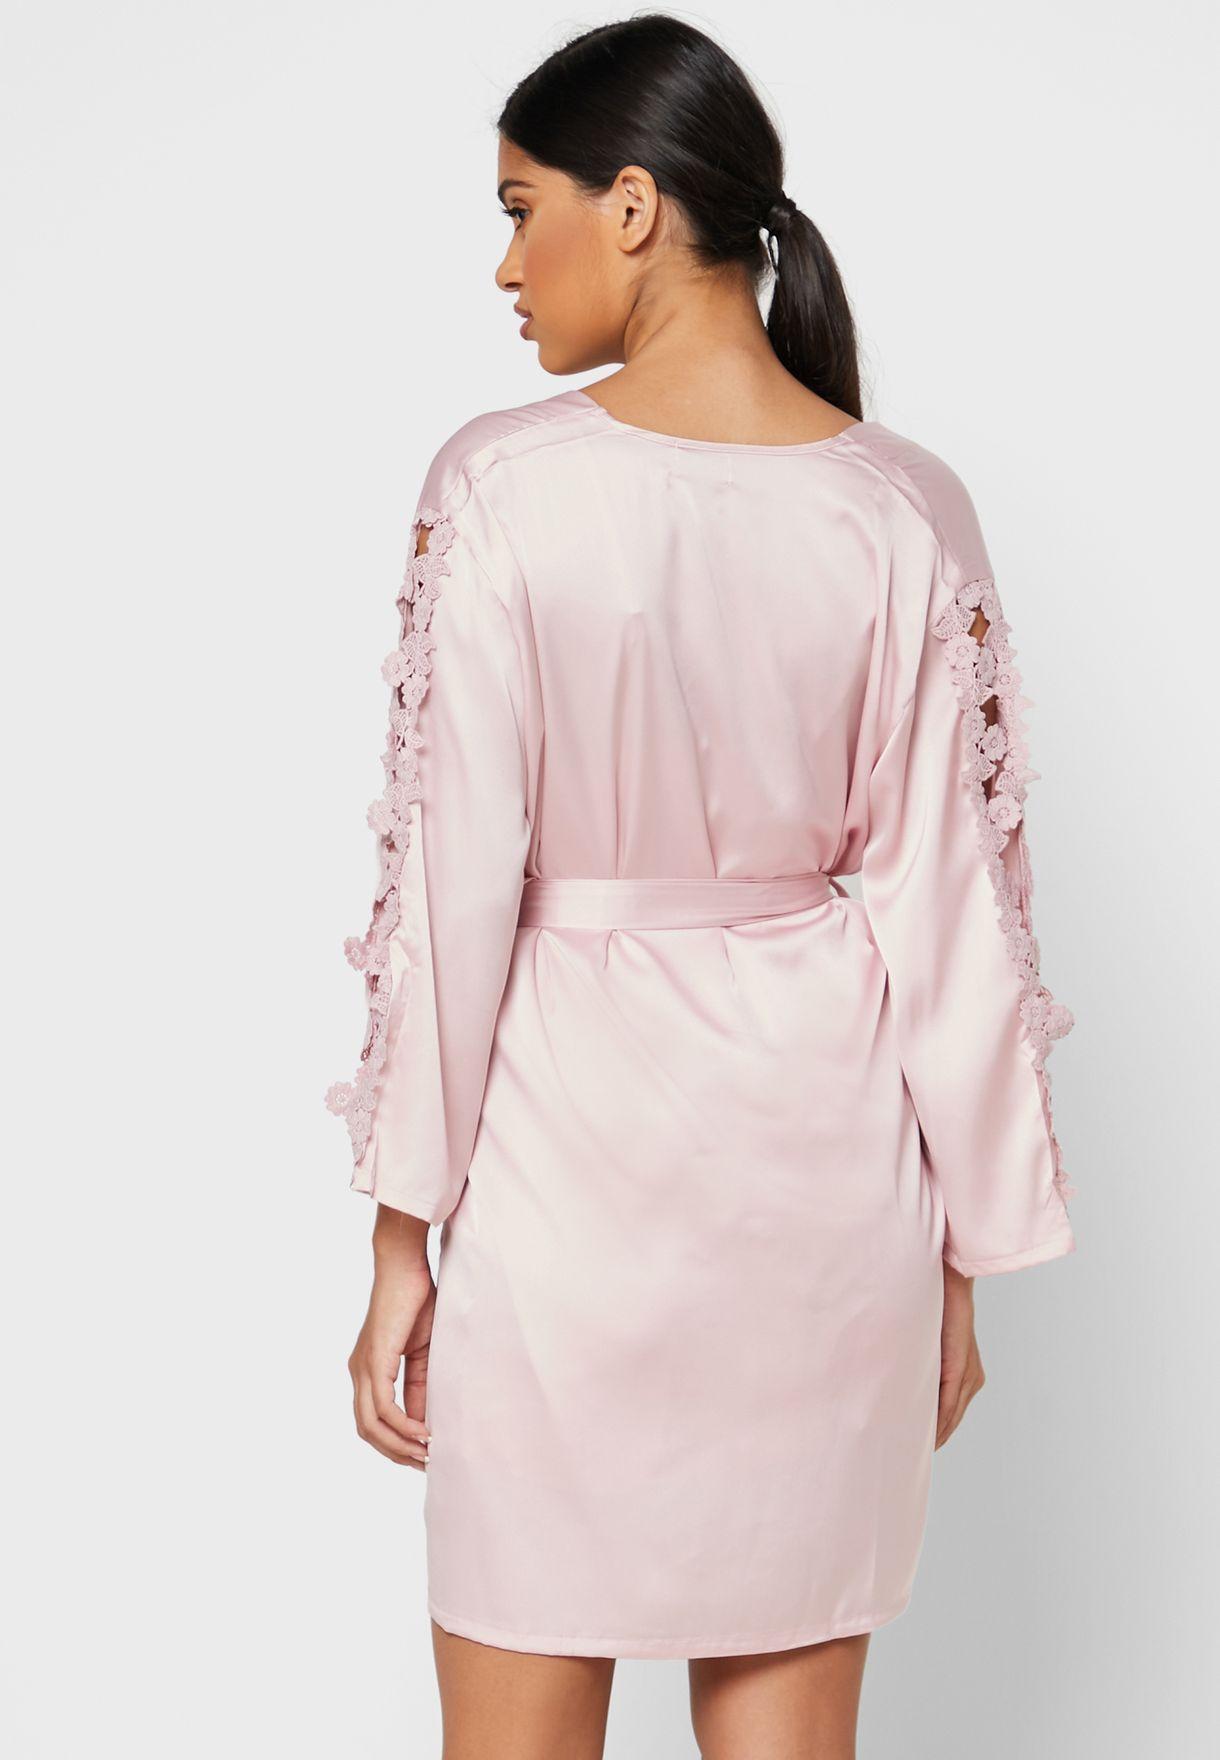 2 In 1 Flower Applique Nightdress Robe